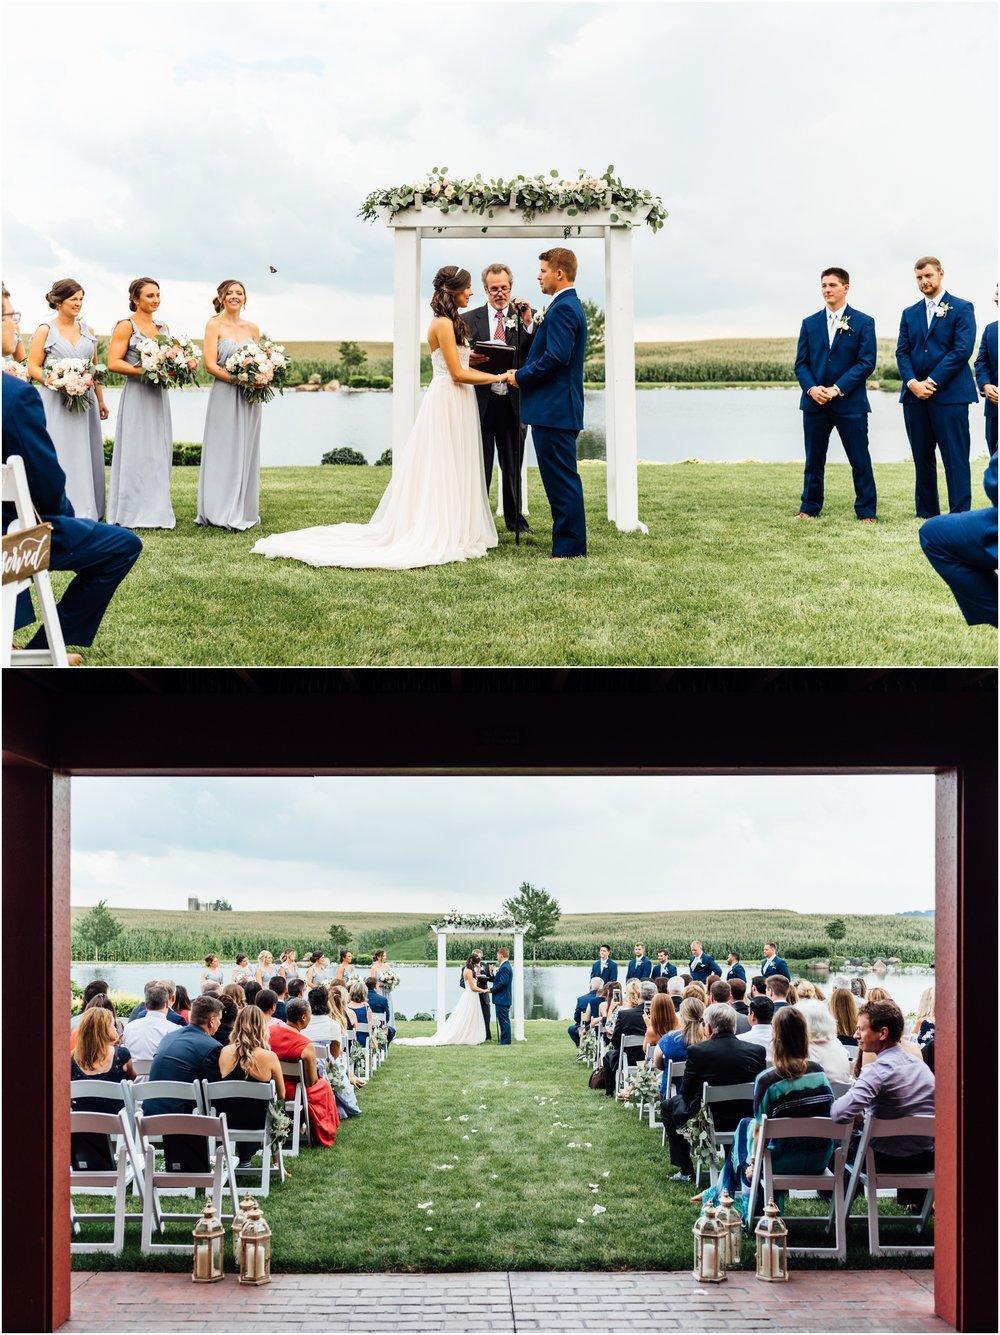 Steph&Bryan_Lancaster_wedding_farm_0518.jpg